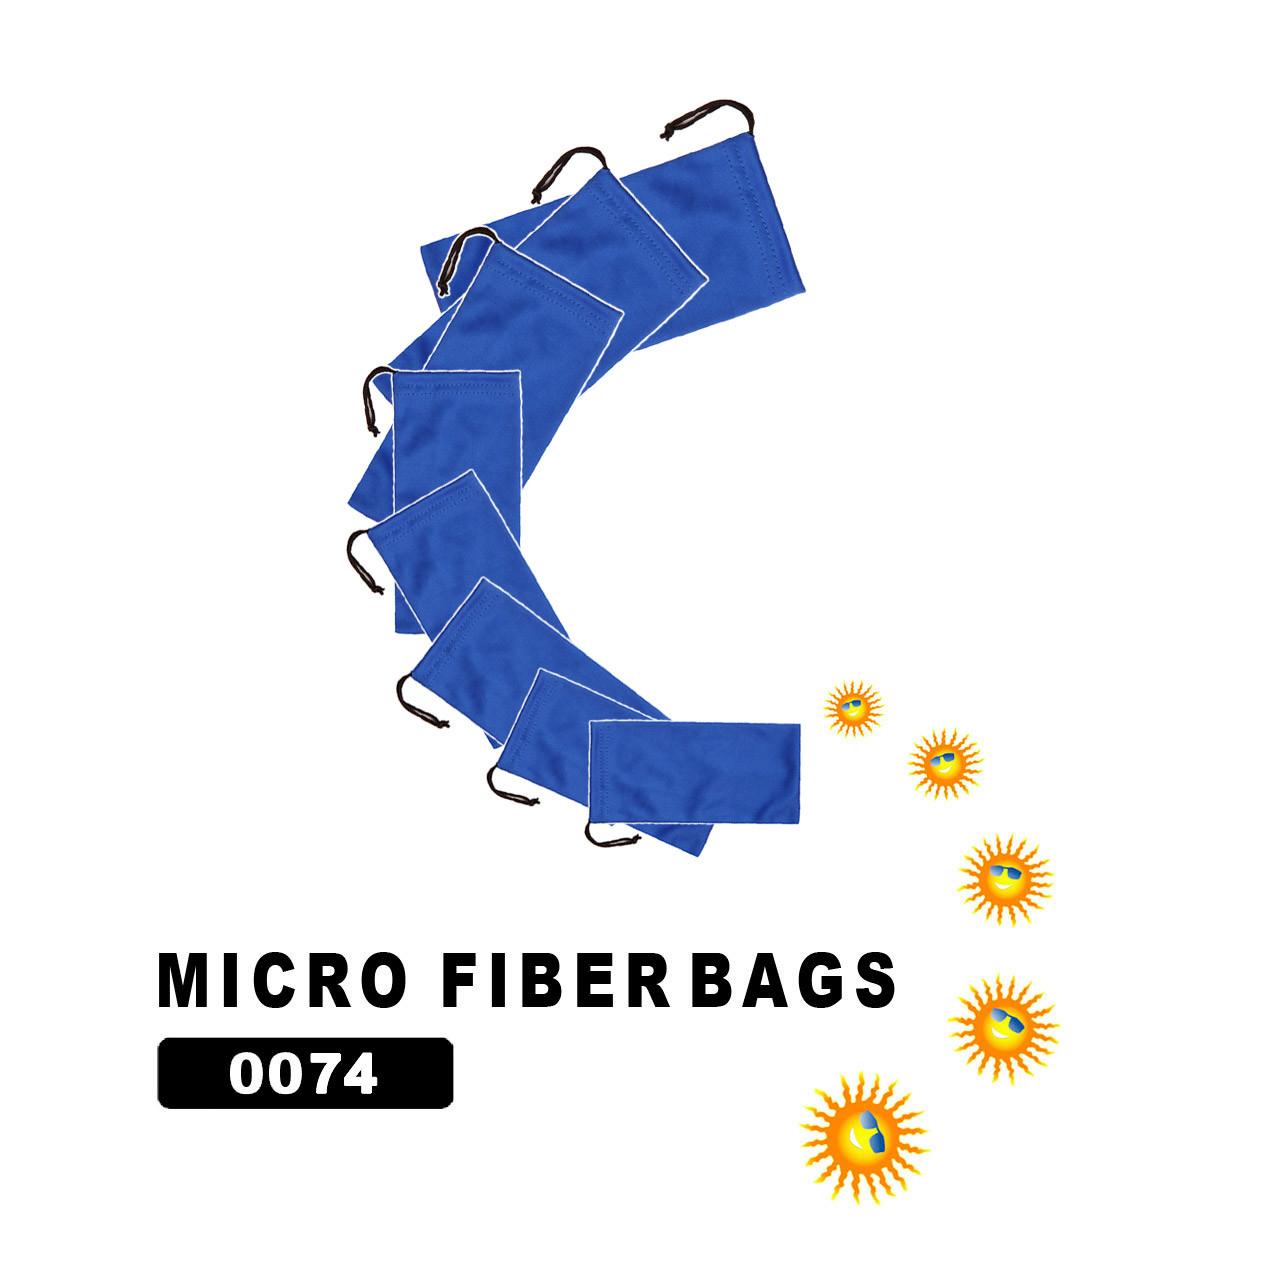 Wholesale Microfiber Bags - Blue #0074